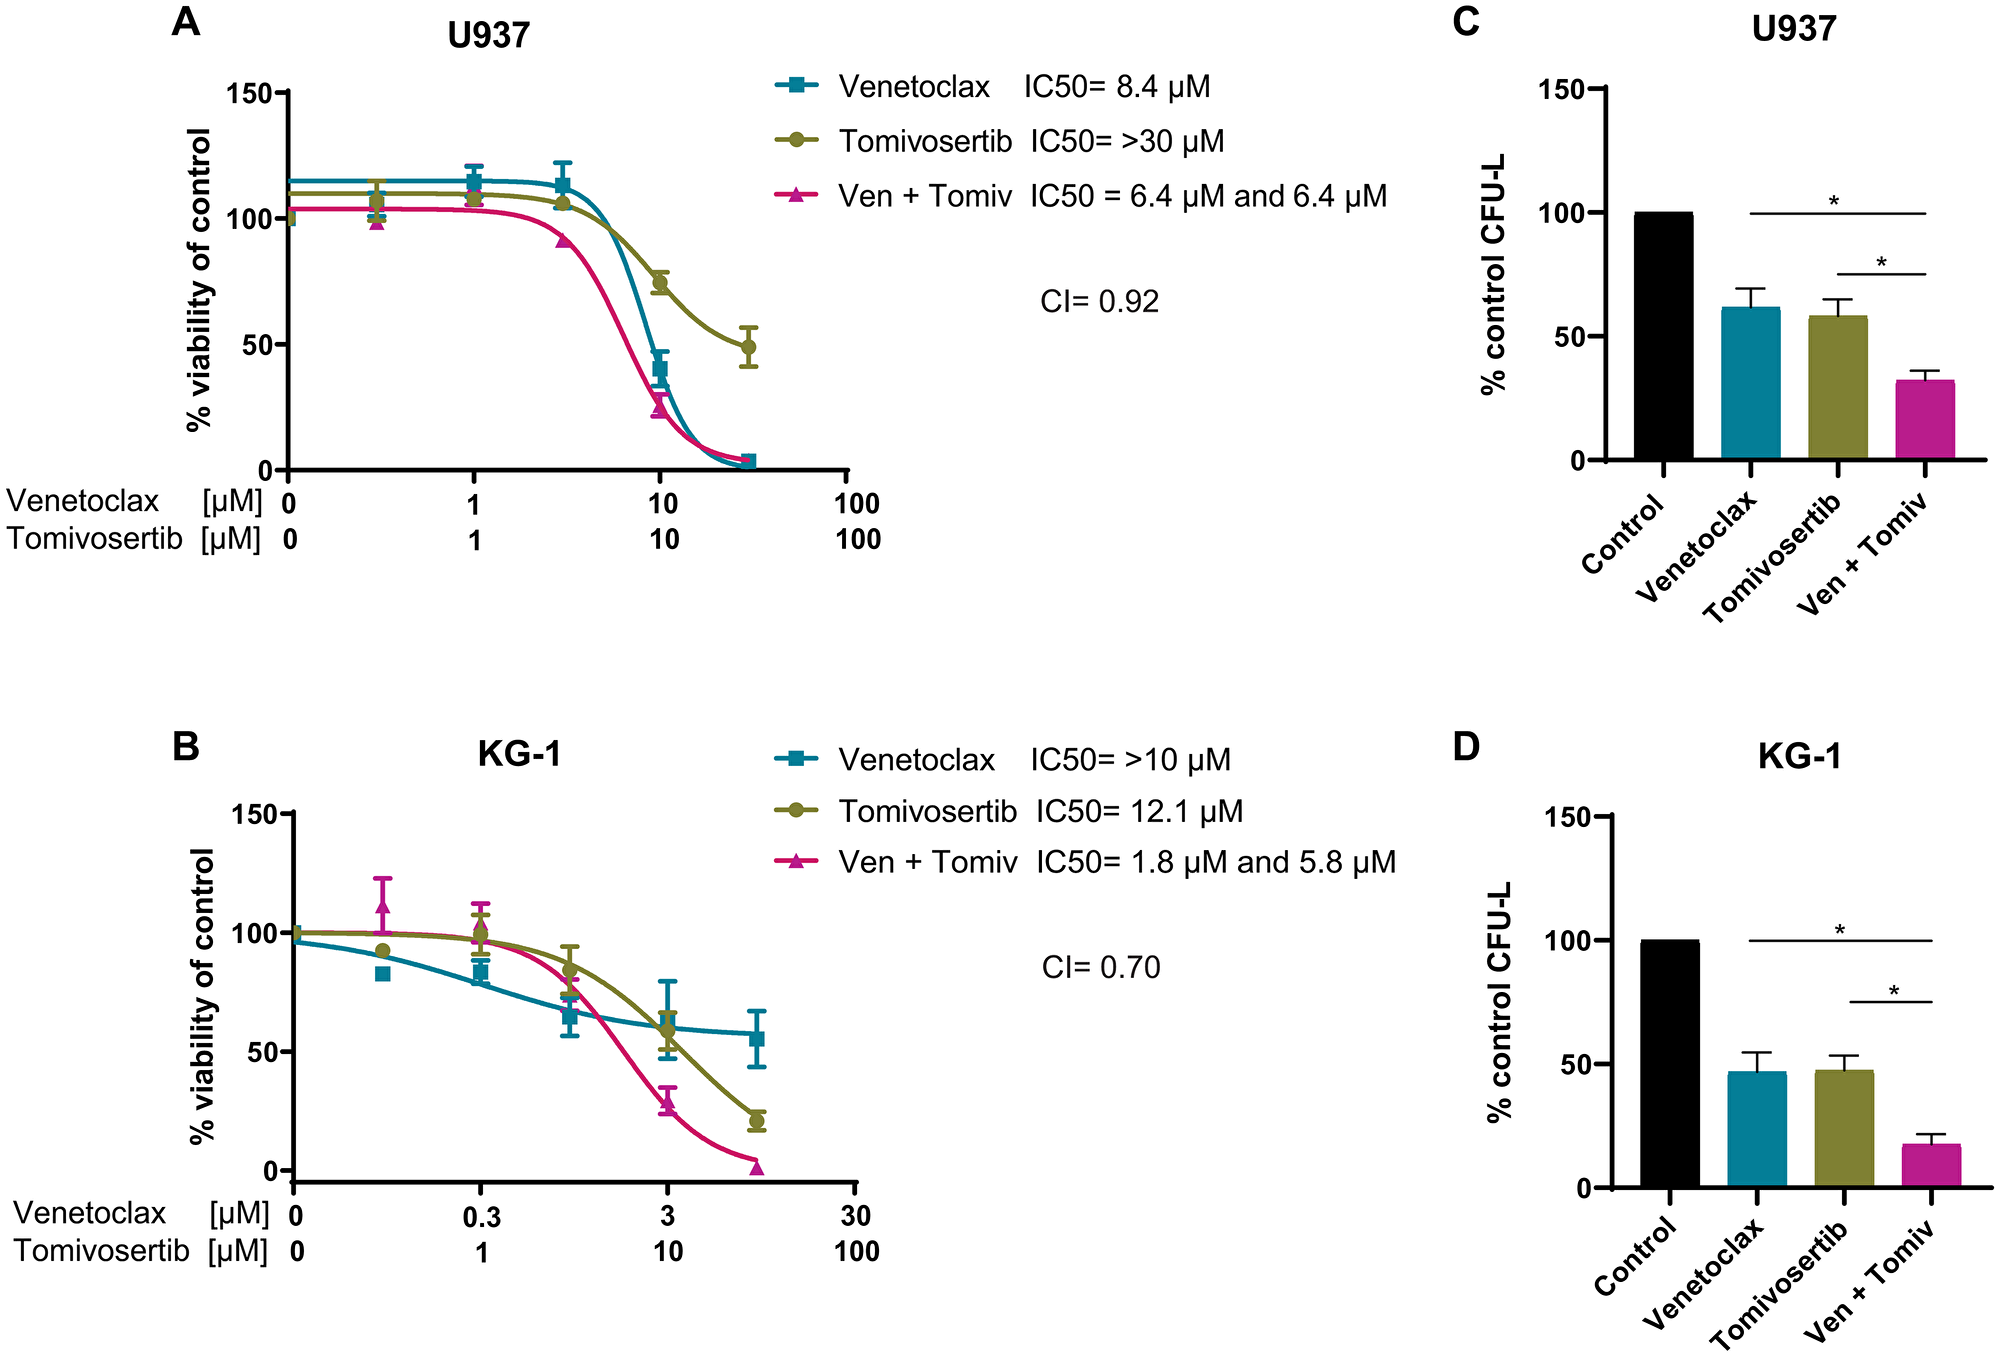 Tomivosertib synergizes with Venetoclax and enhances its anti-leukemic effects in vitro.